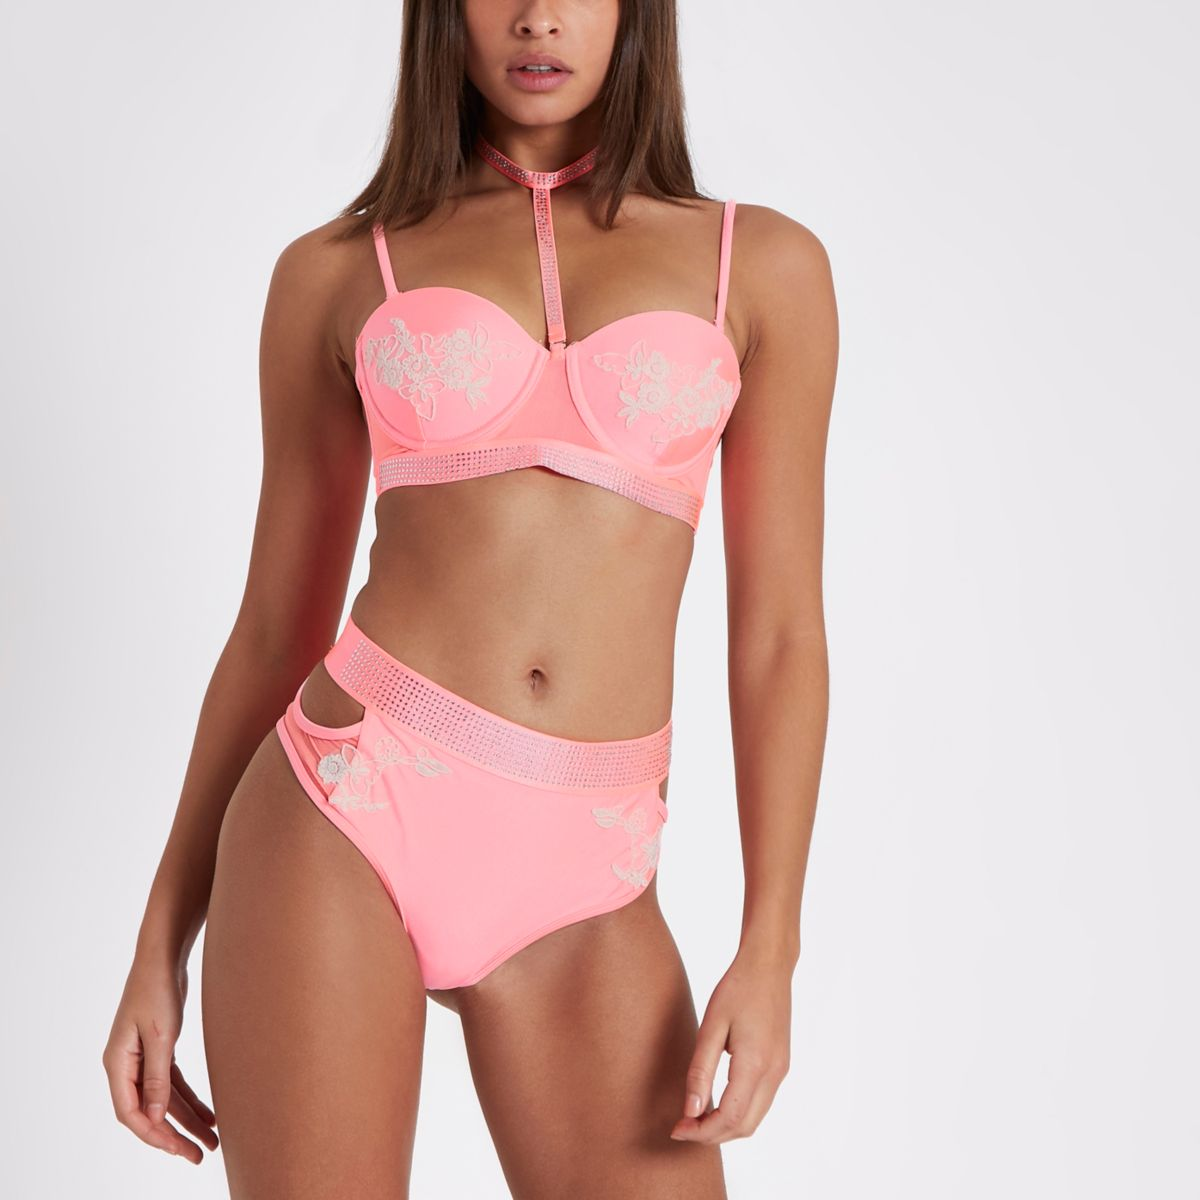 Coral diamante high waisted bikini bottoms